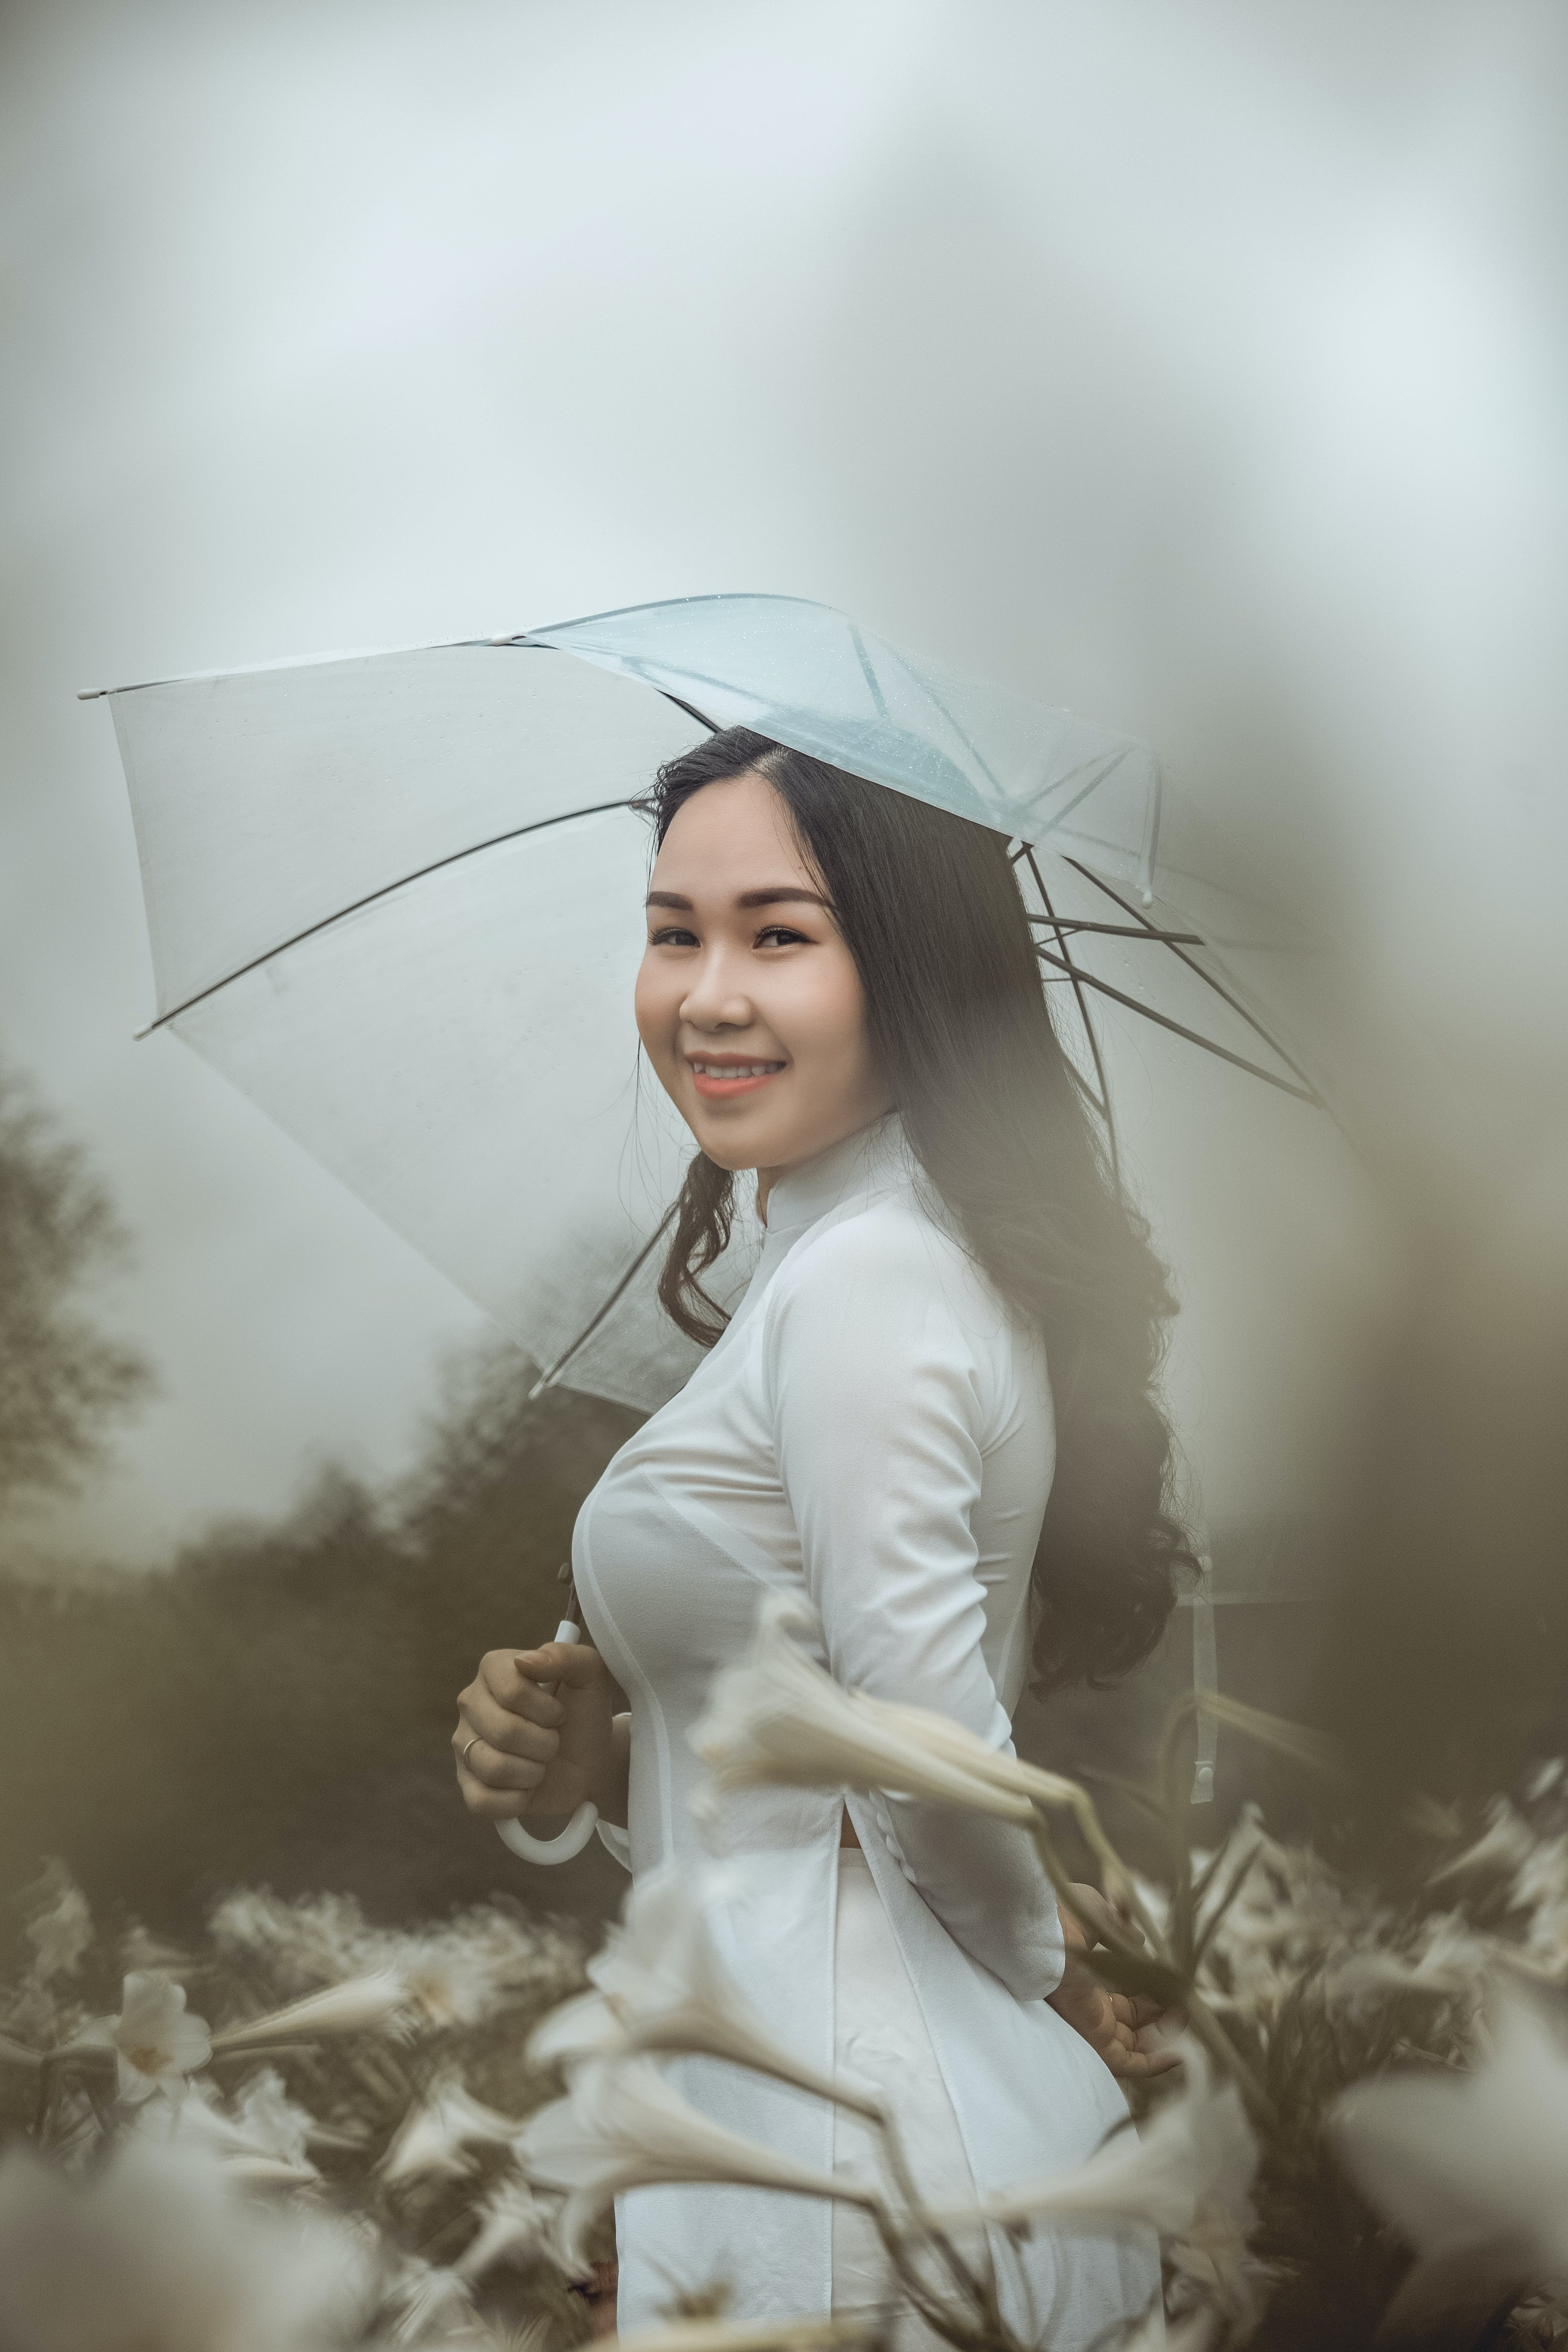 Smiling Woman Wearing White Long-sleeved Dress Holding White Umbrella